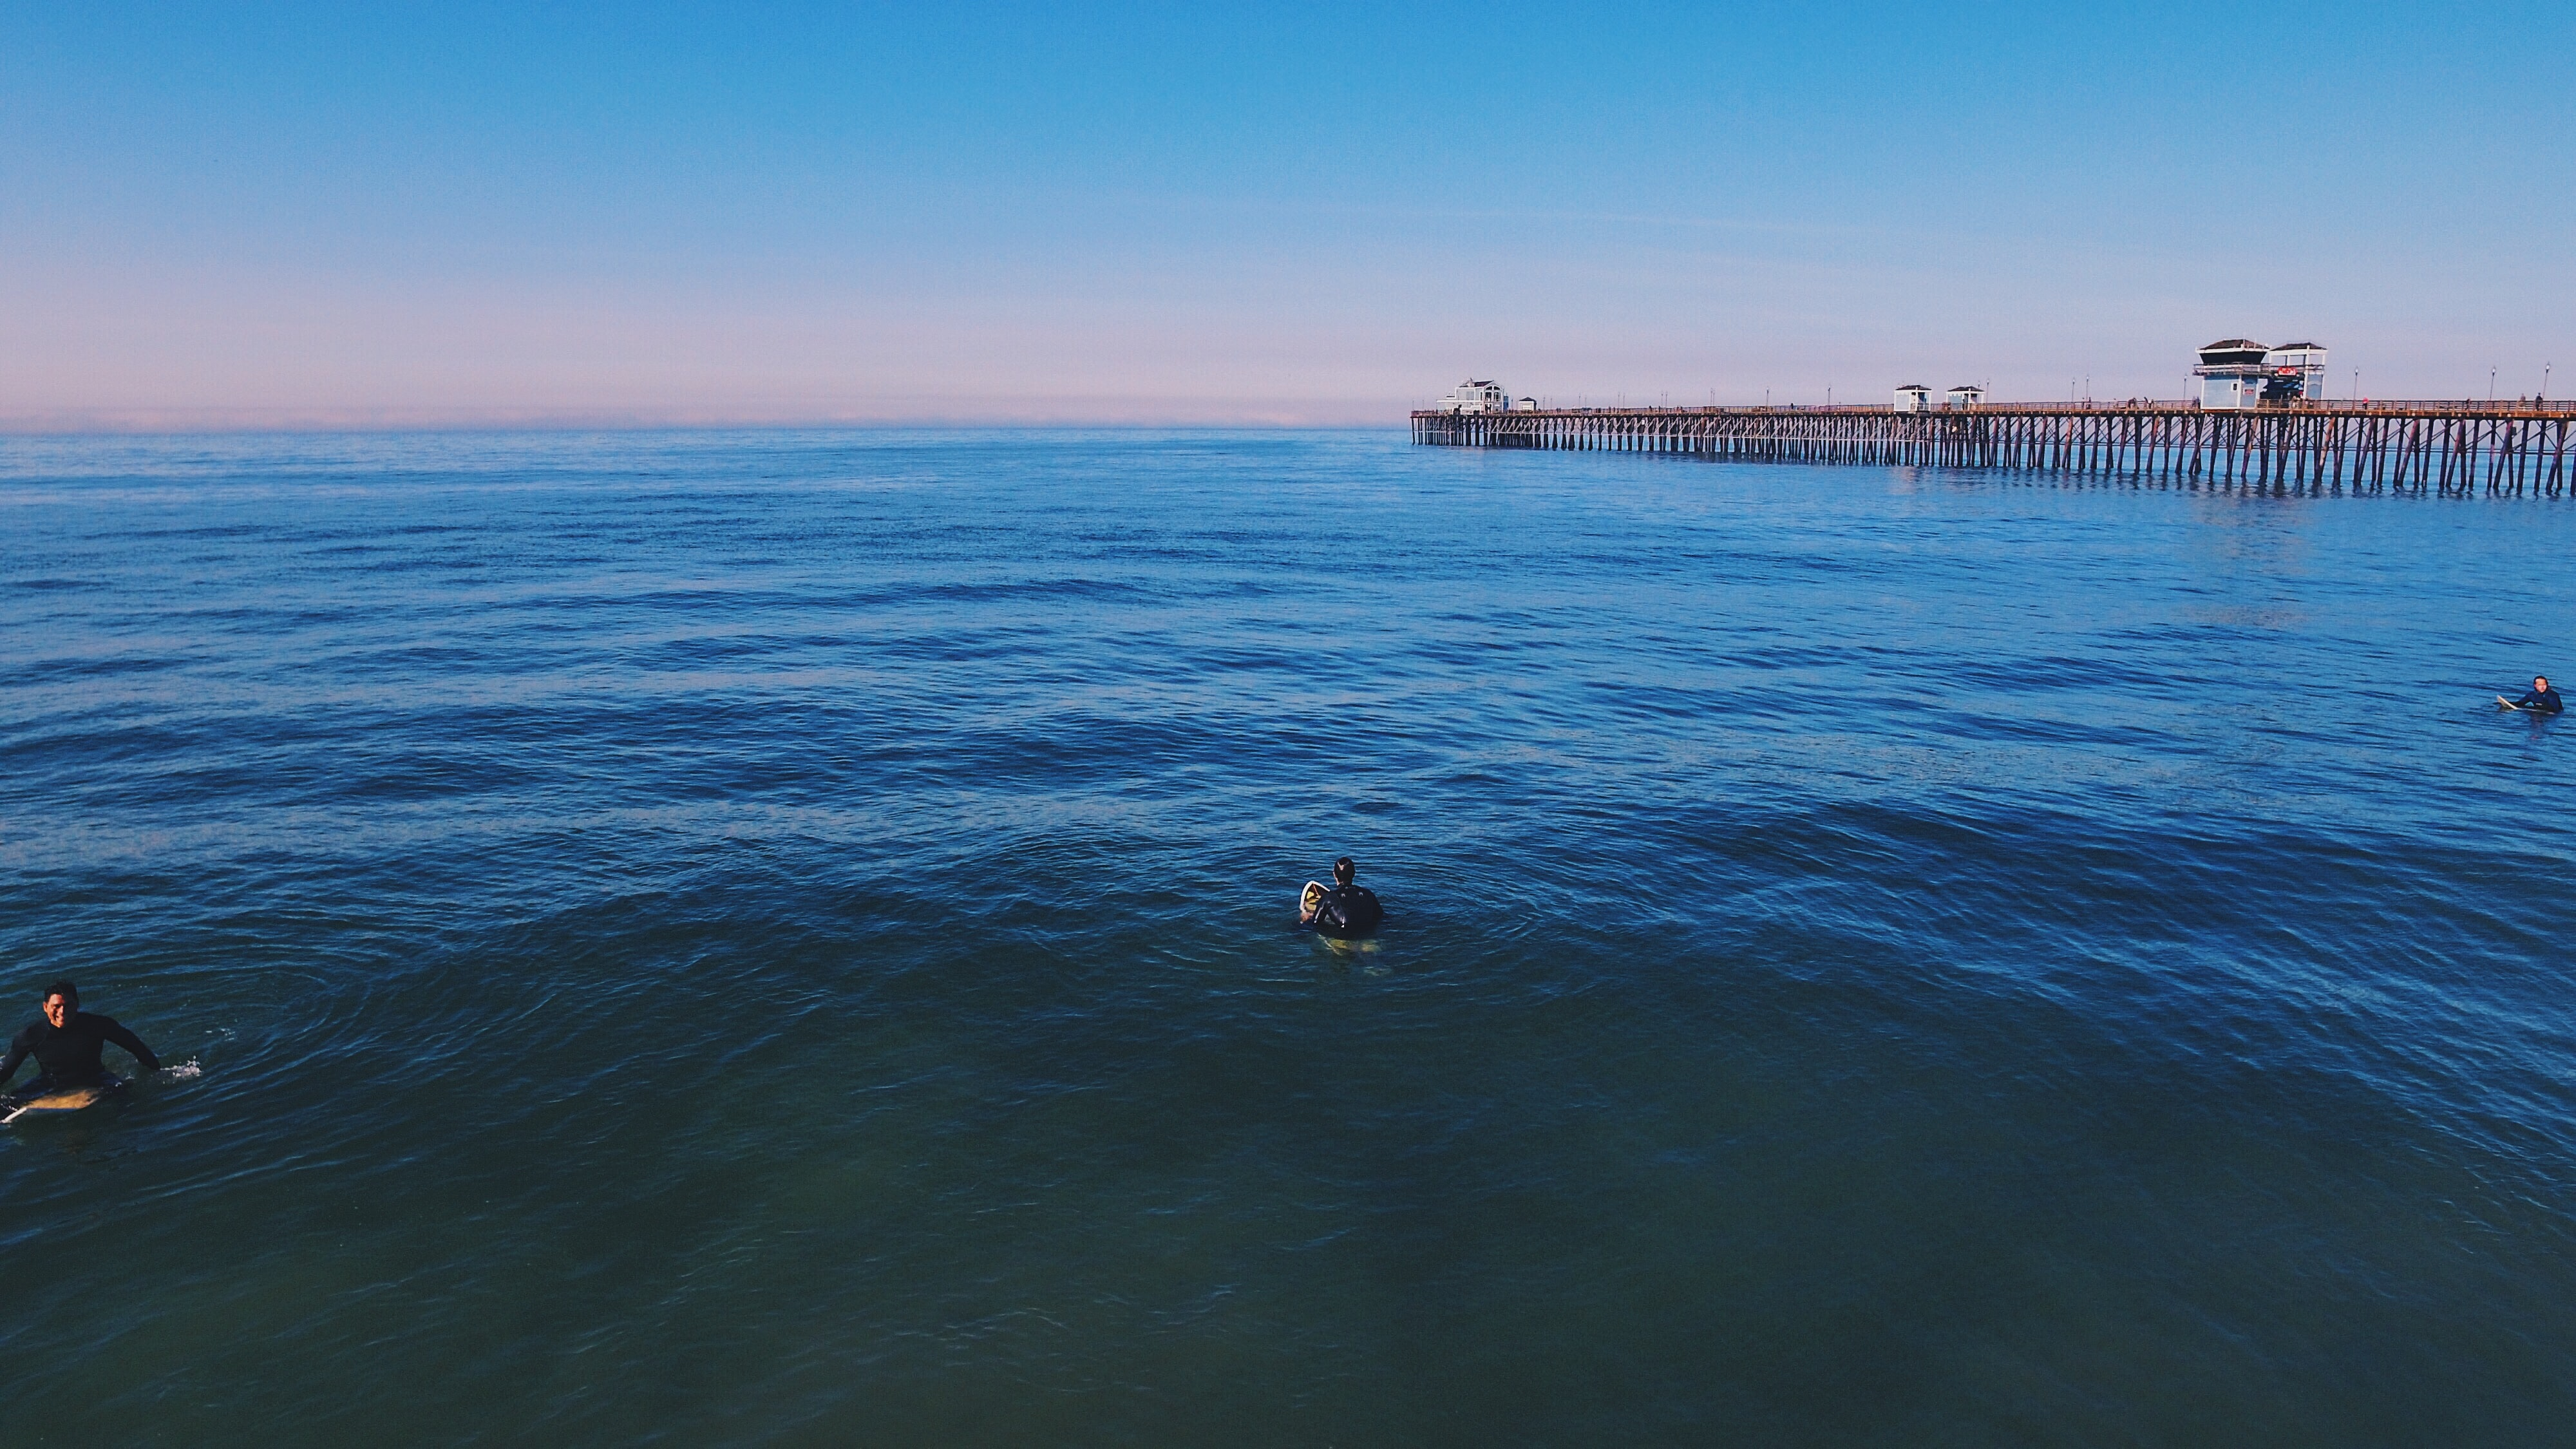 three people swimming on ocean under blue sky